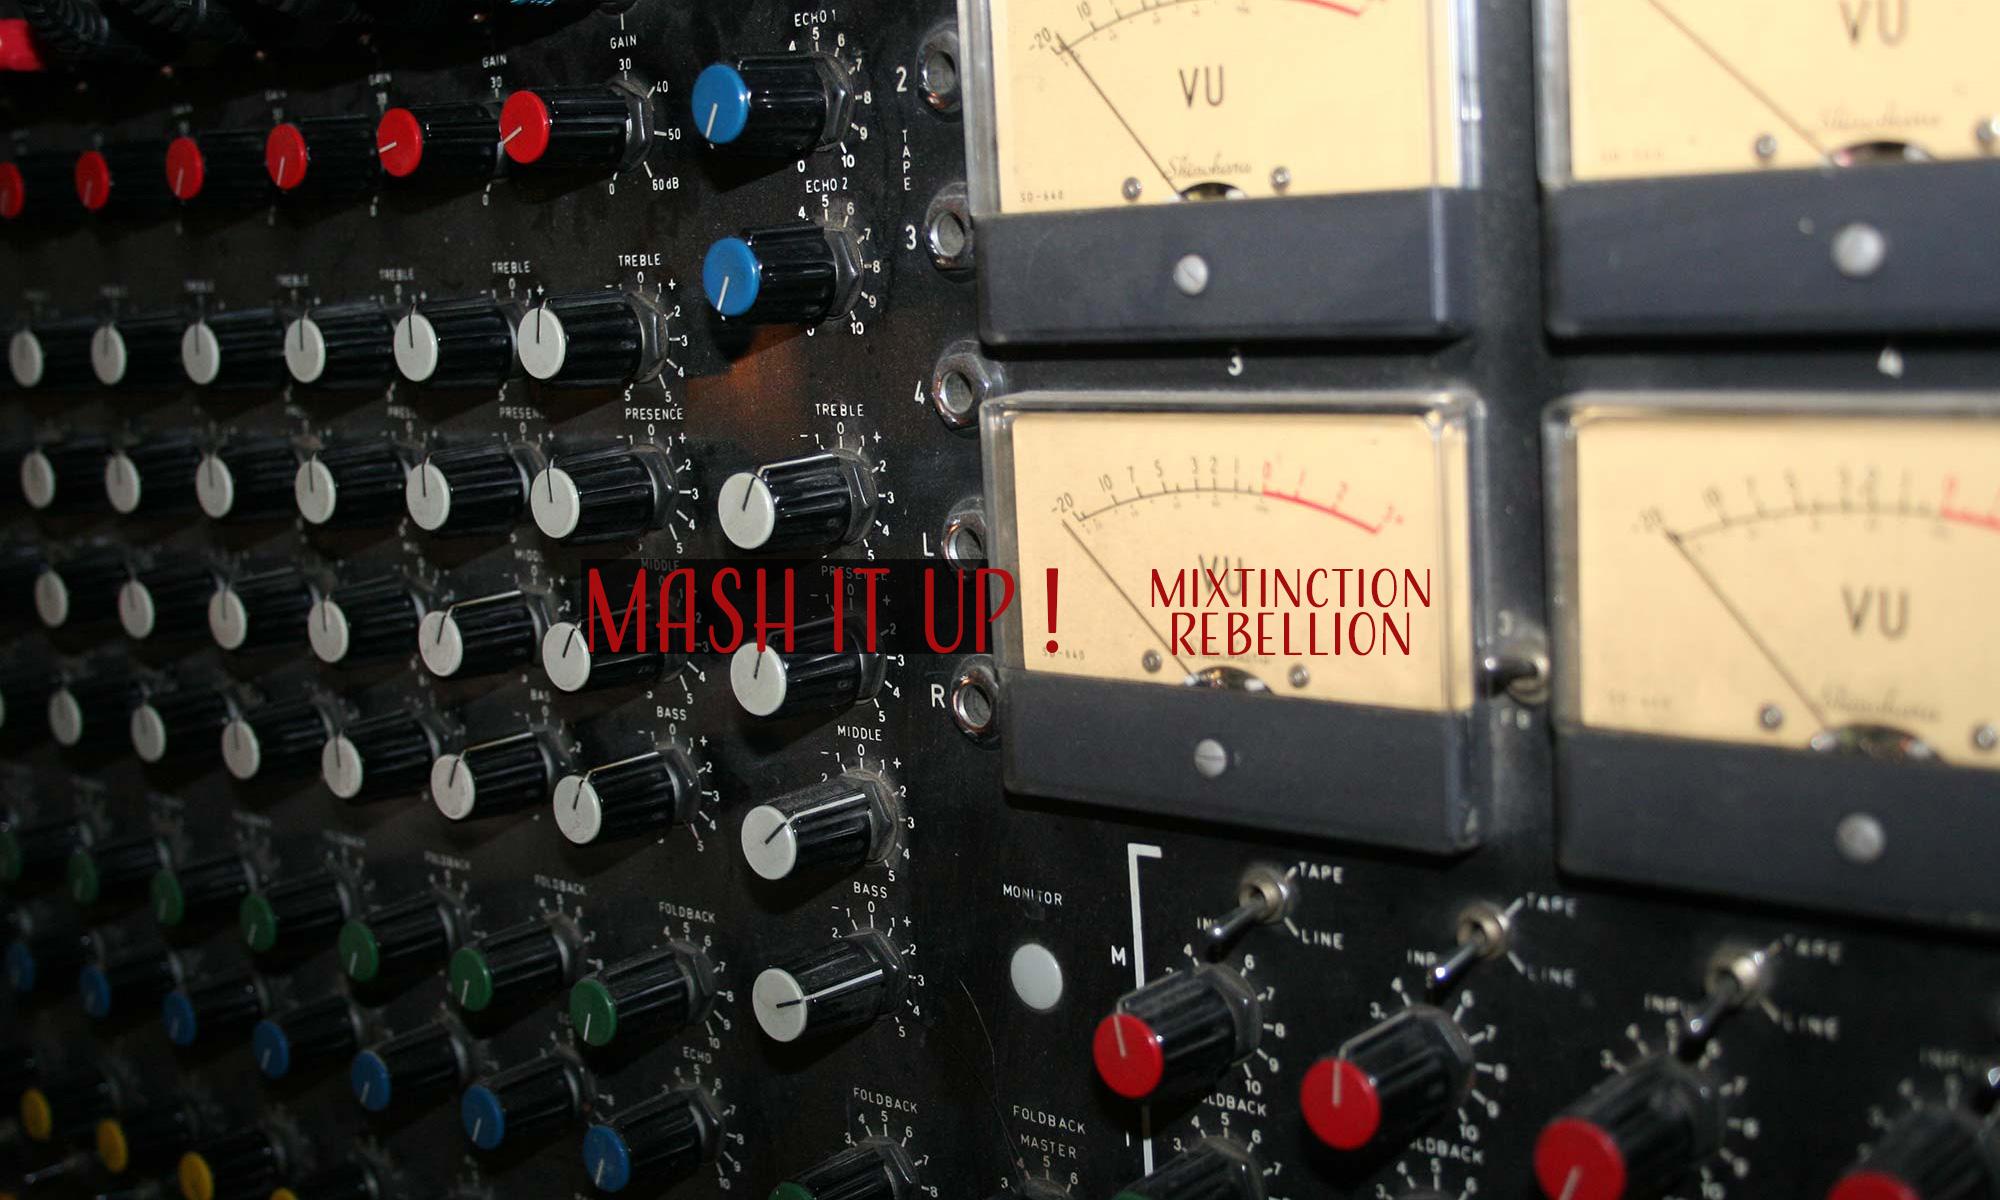 Mixtinction Rebellion